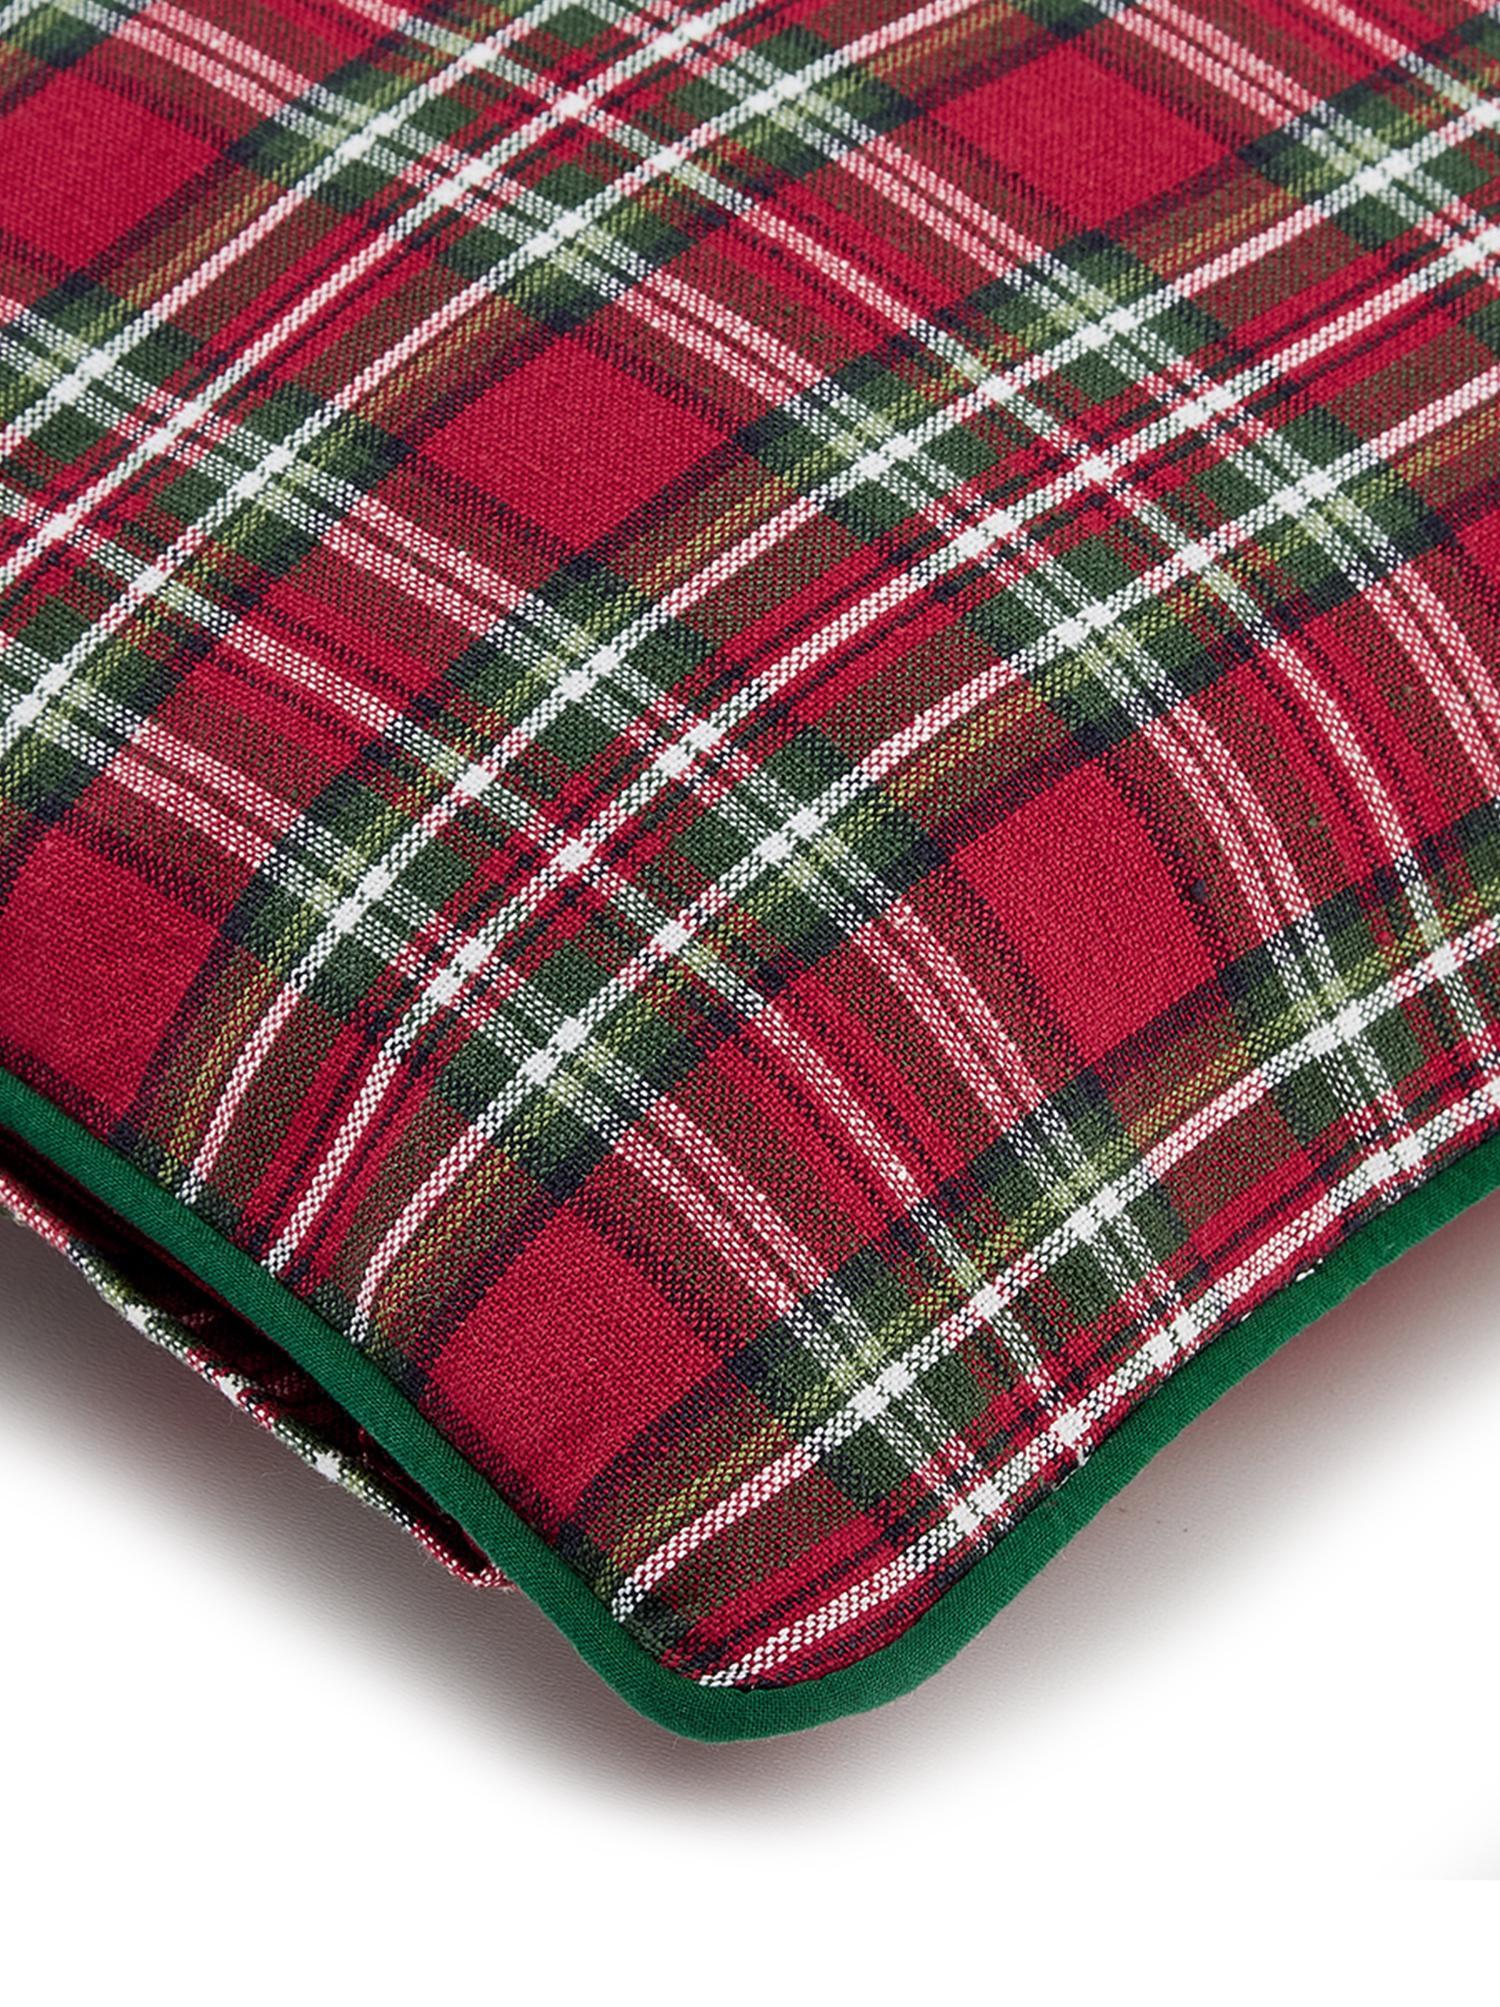 Funda de cojín Tartan, 100%algodón, Rojo, verde oscuro, An 45 x L 45 cm